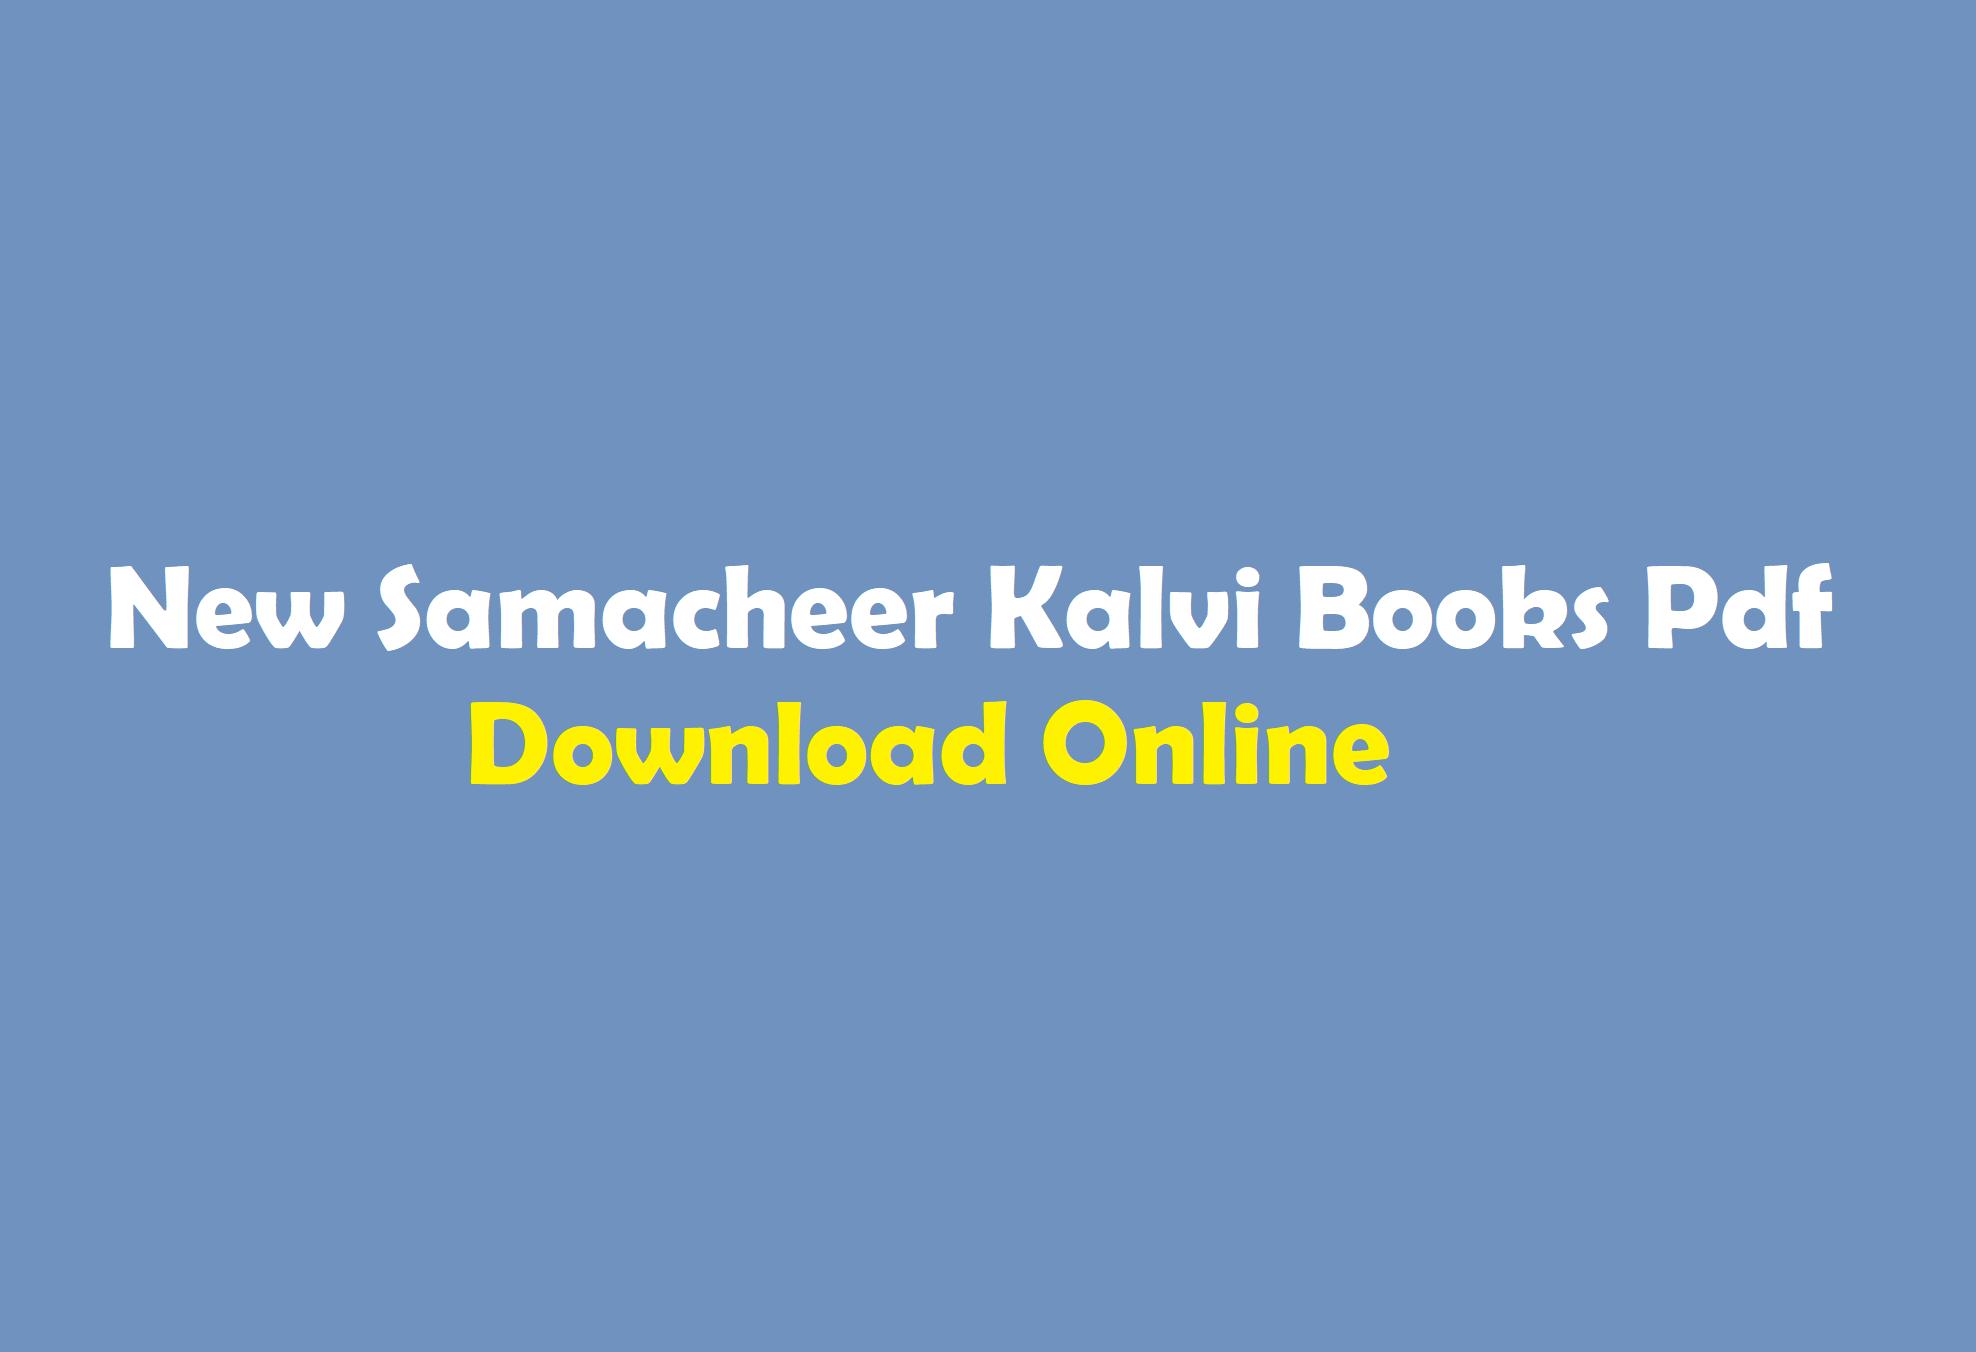 Tamilnadu 12th Standard Old Samacheer Kalvi Books